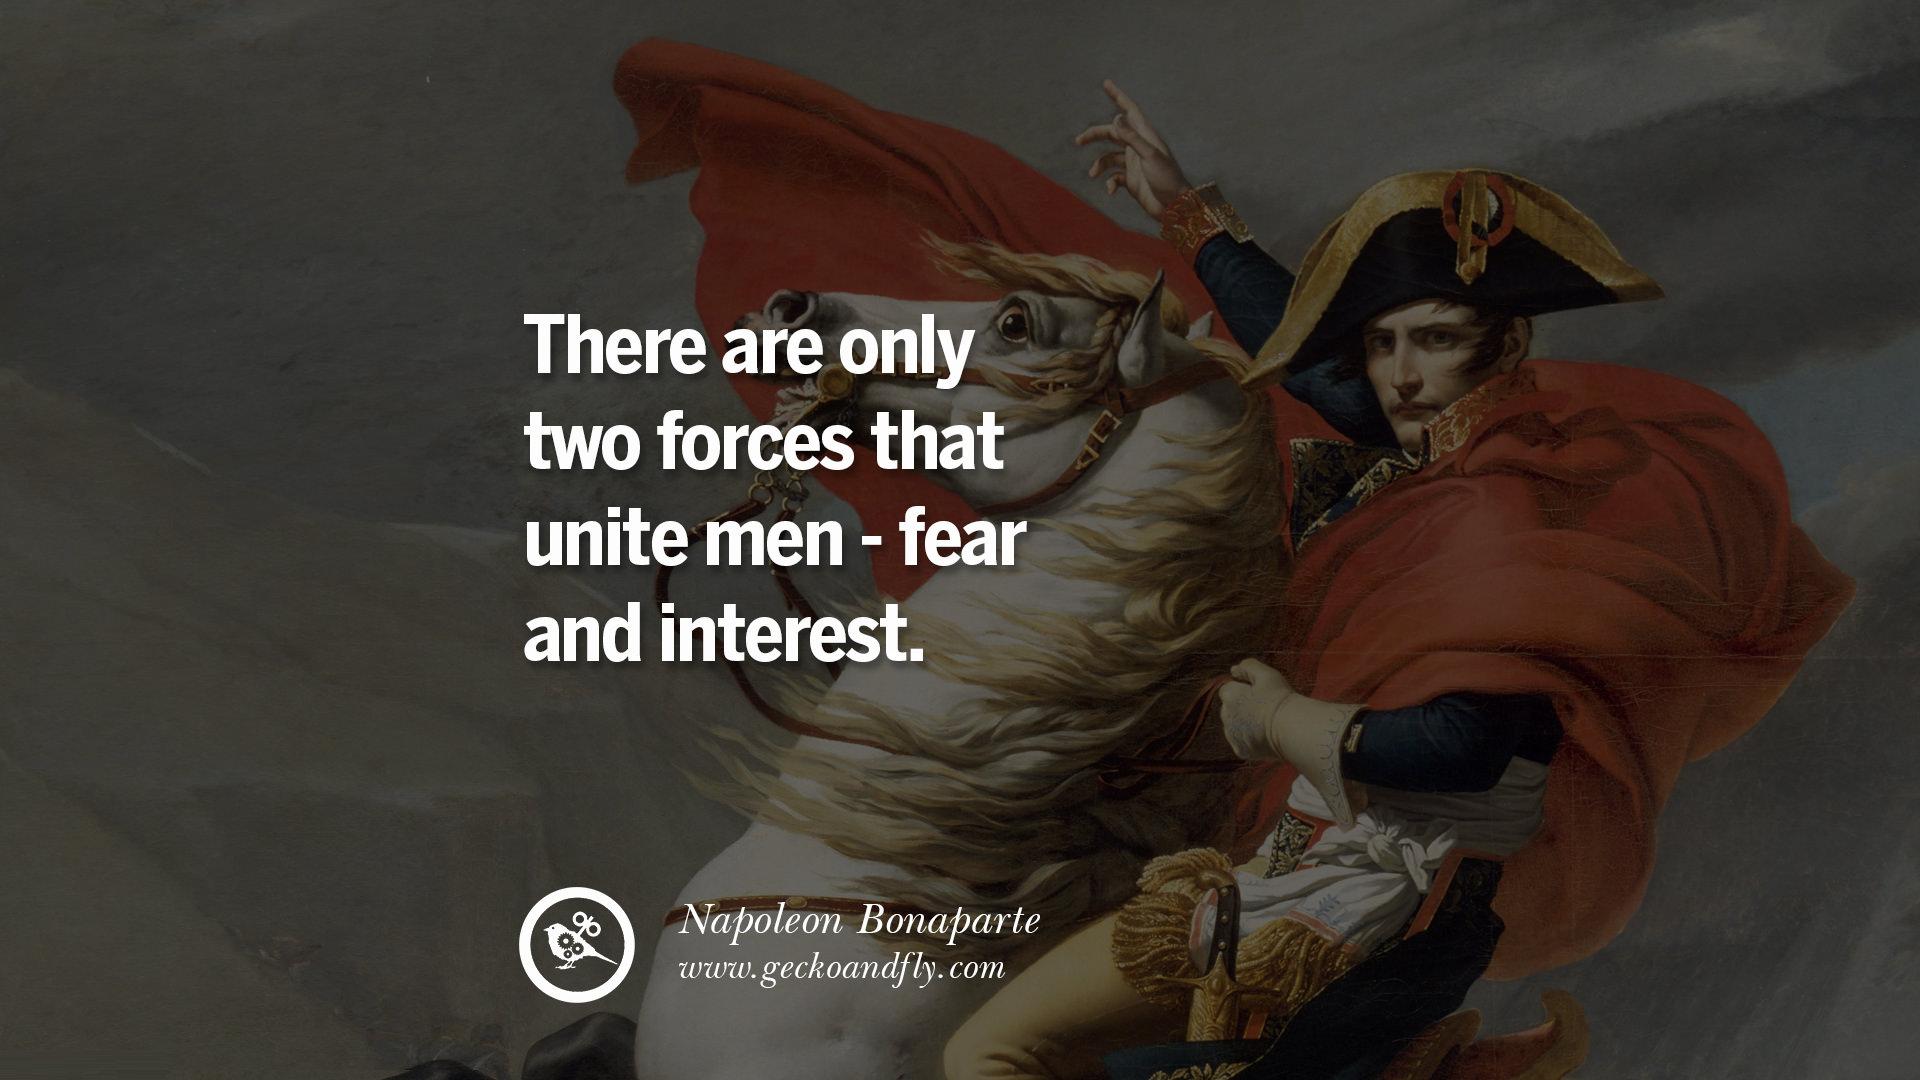 Fear Quotes 40 Napoleon Bonaparte Quotes On War Religion Politics And